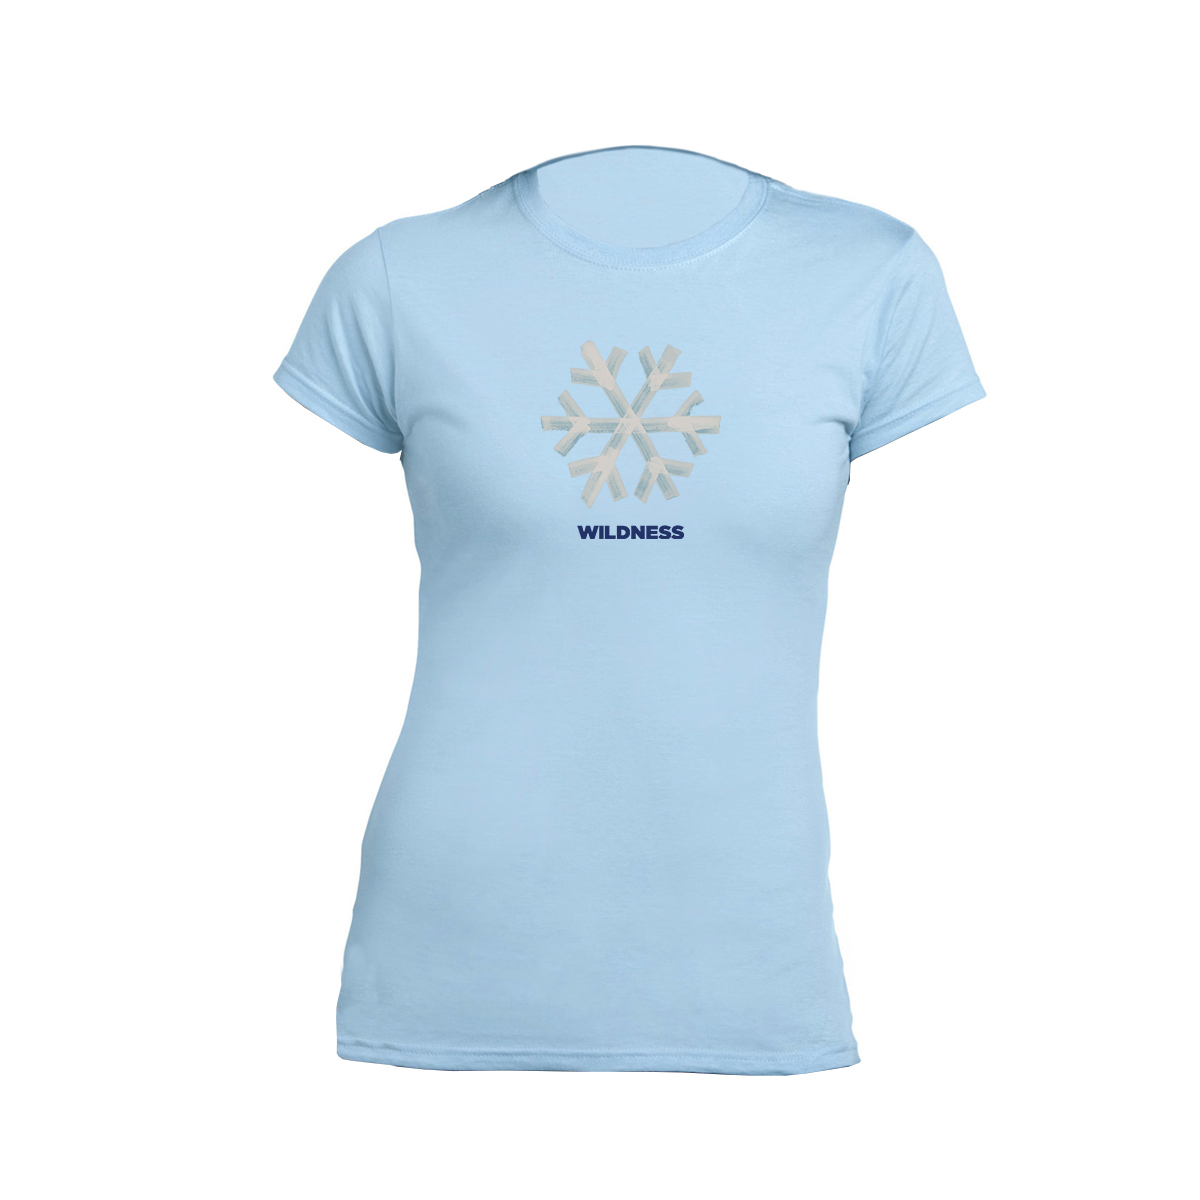 Snowflake Tour - Date Back Ladies Blue Tee - Snow Patrol